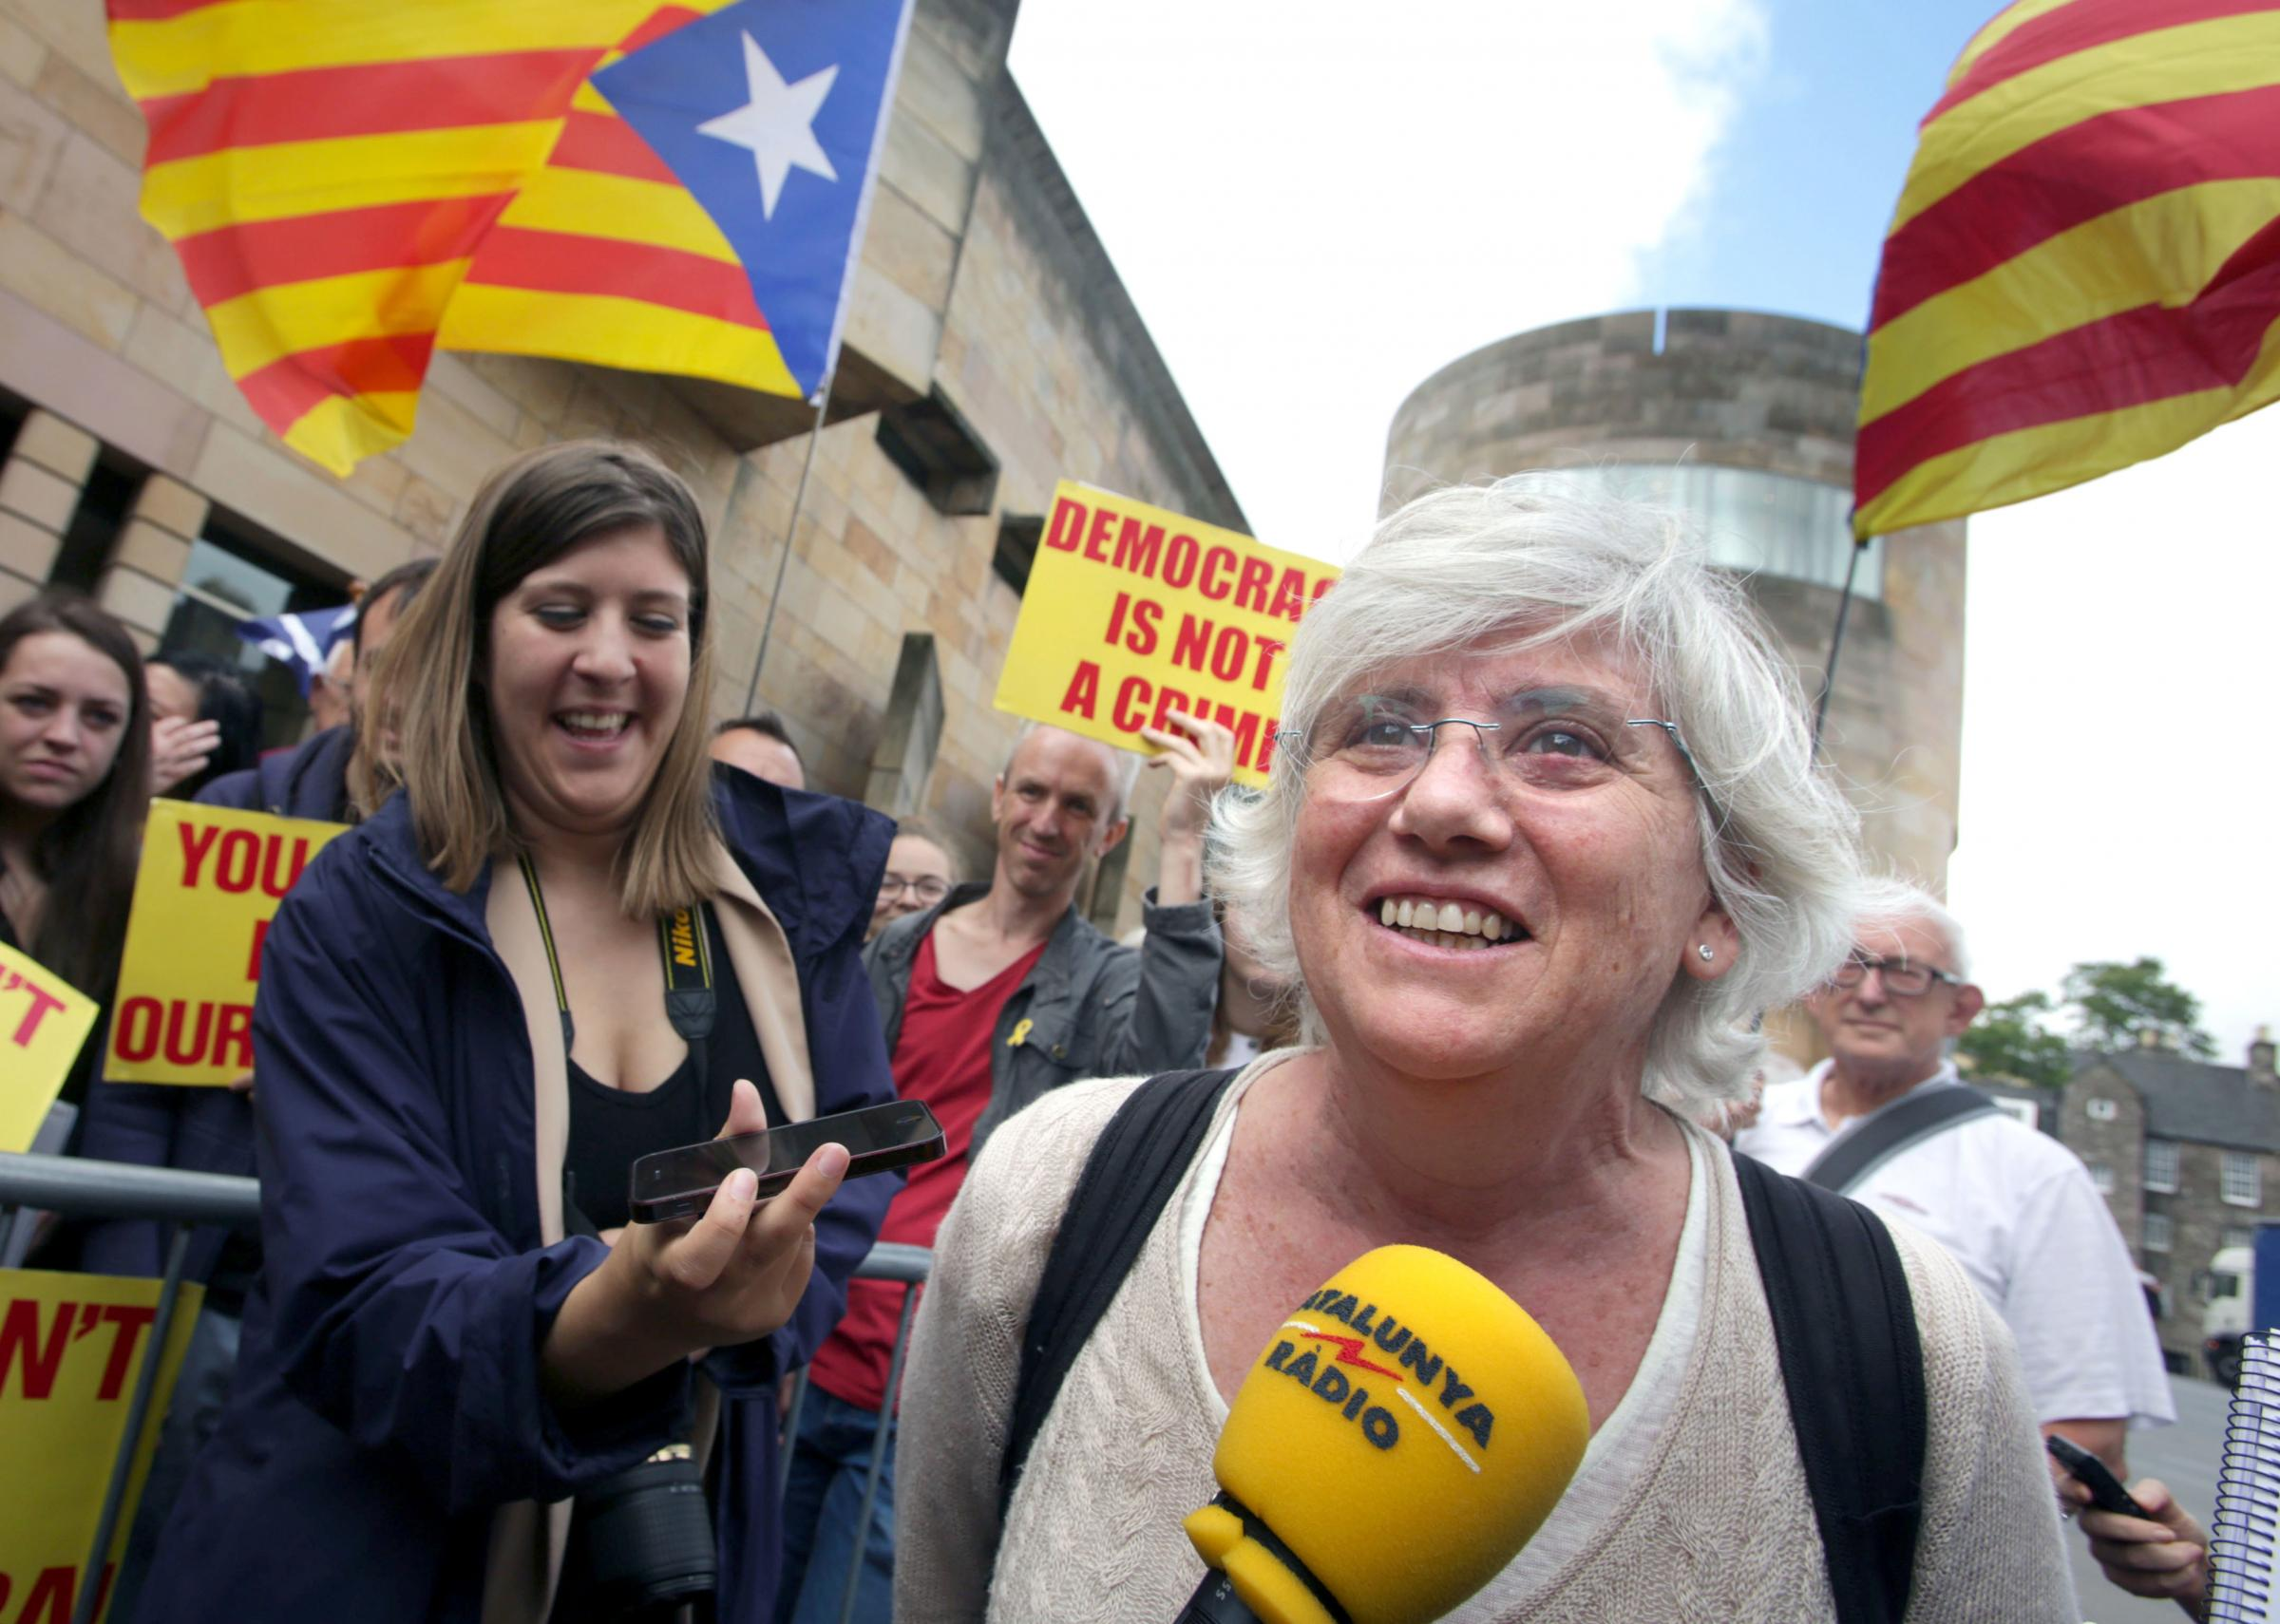 Clara Ponsati backs Catalan civil disobedience push